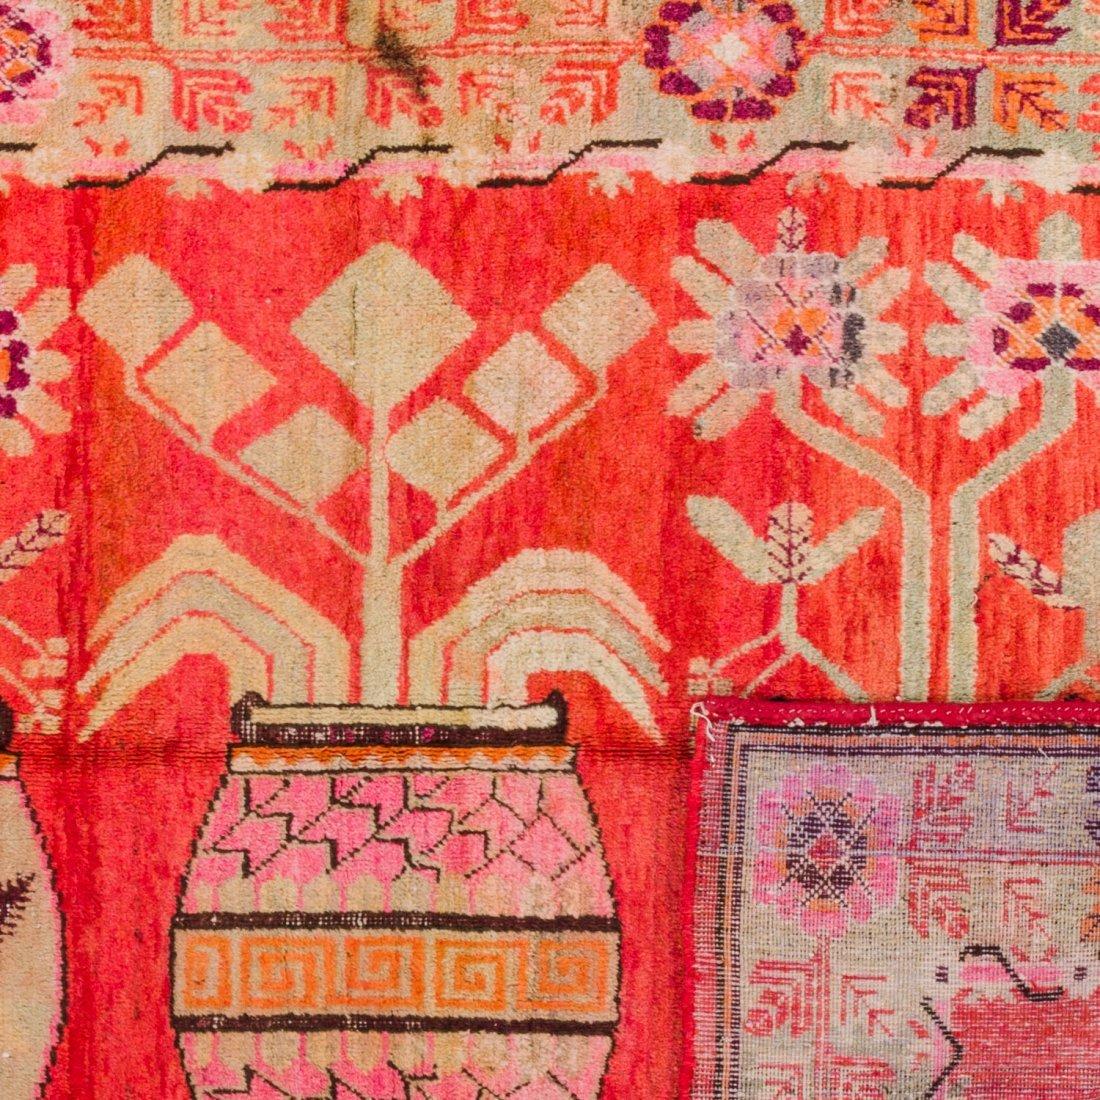 Antique Samarkand Rug: 4'8'' x 6'5'' - 2